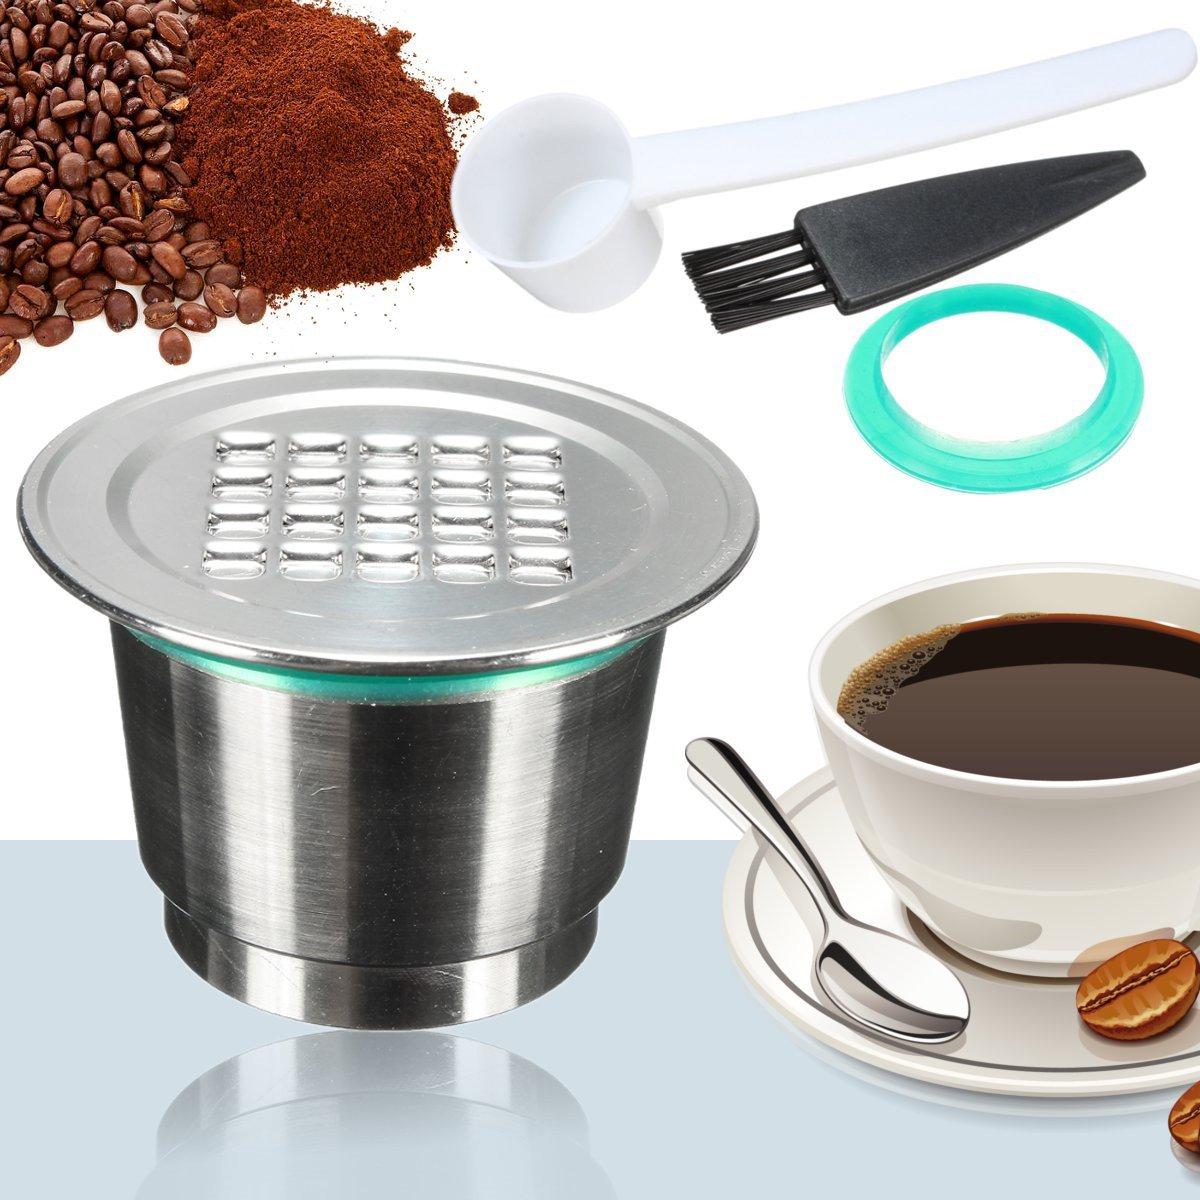 QOJA 2 generation stainless steel coffee refillable capsule+spoon+brush